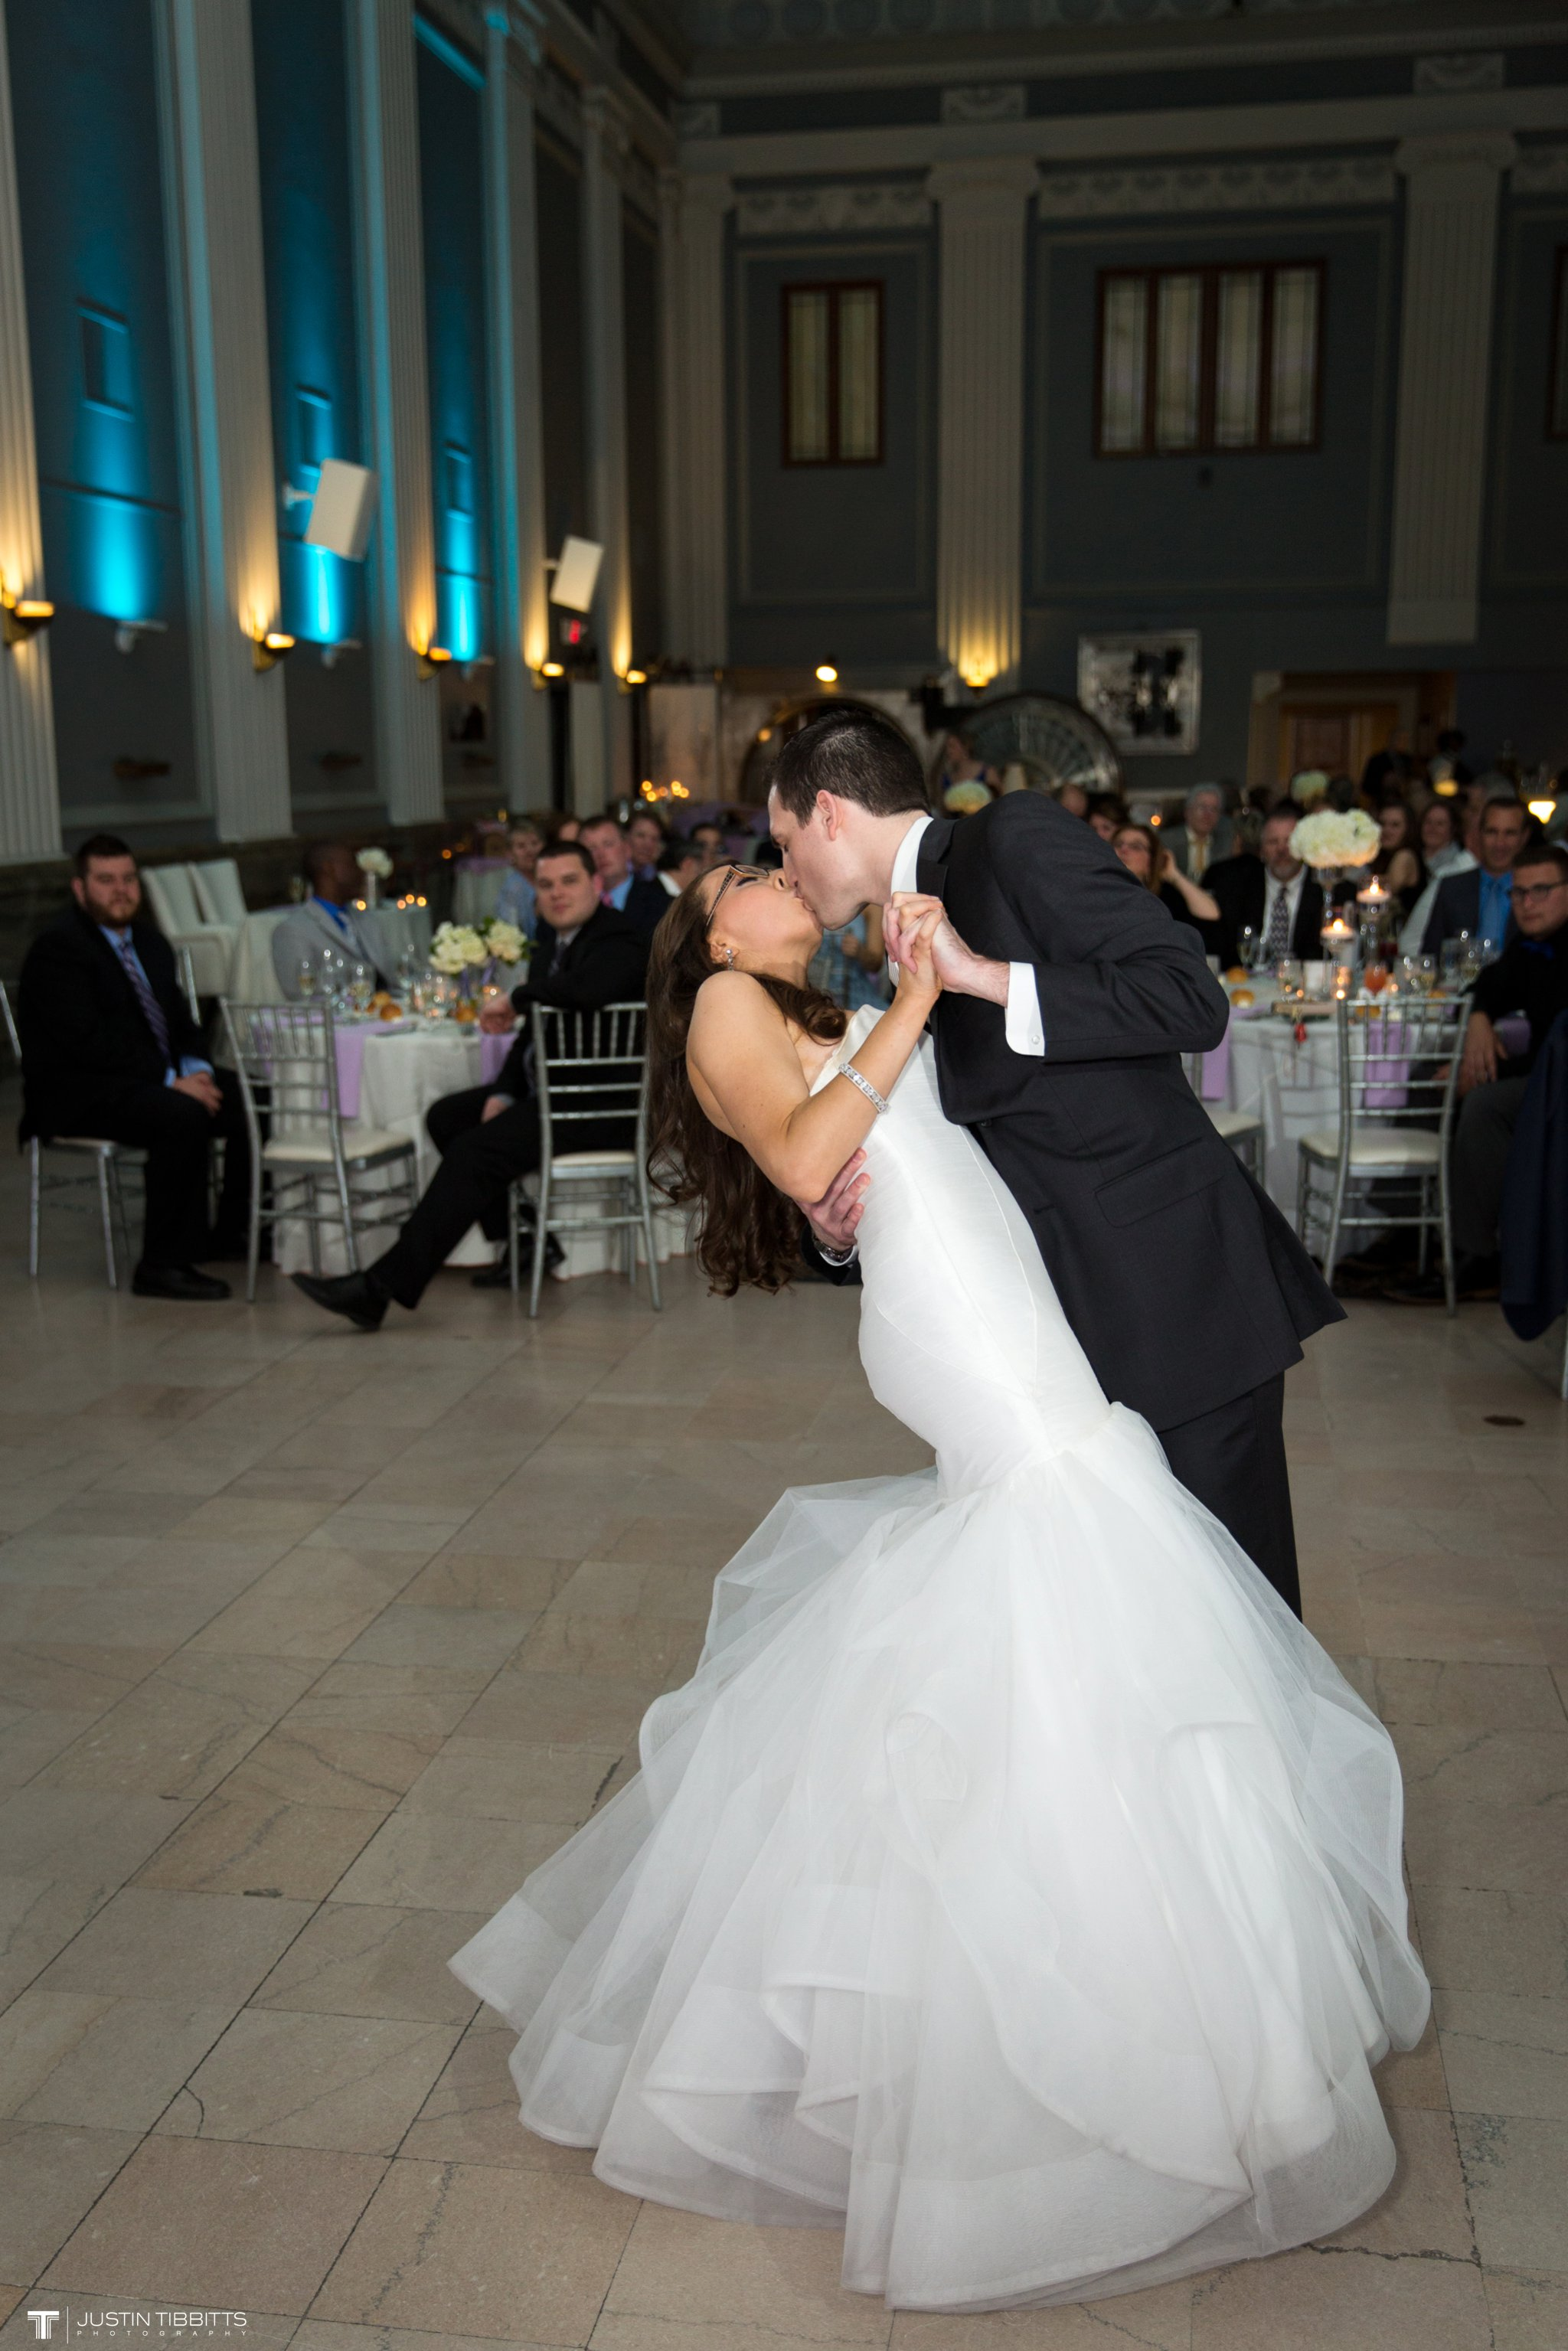 Antonia and Nicks Key Hall at Proctors Wedding Photos_0165